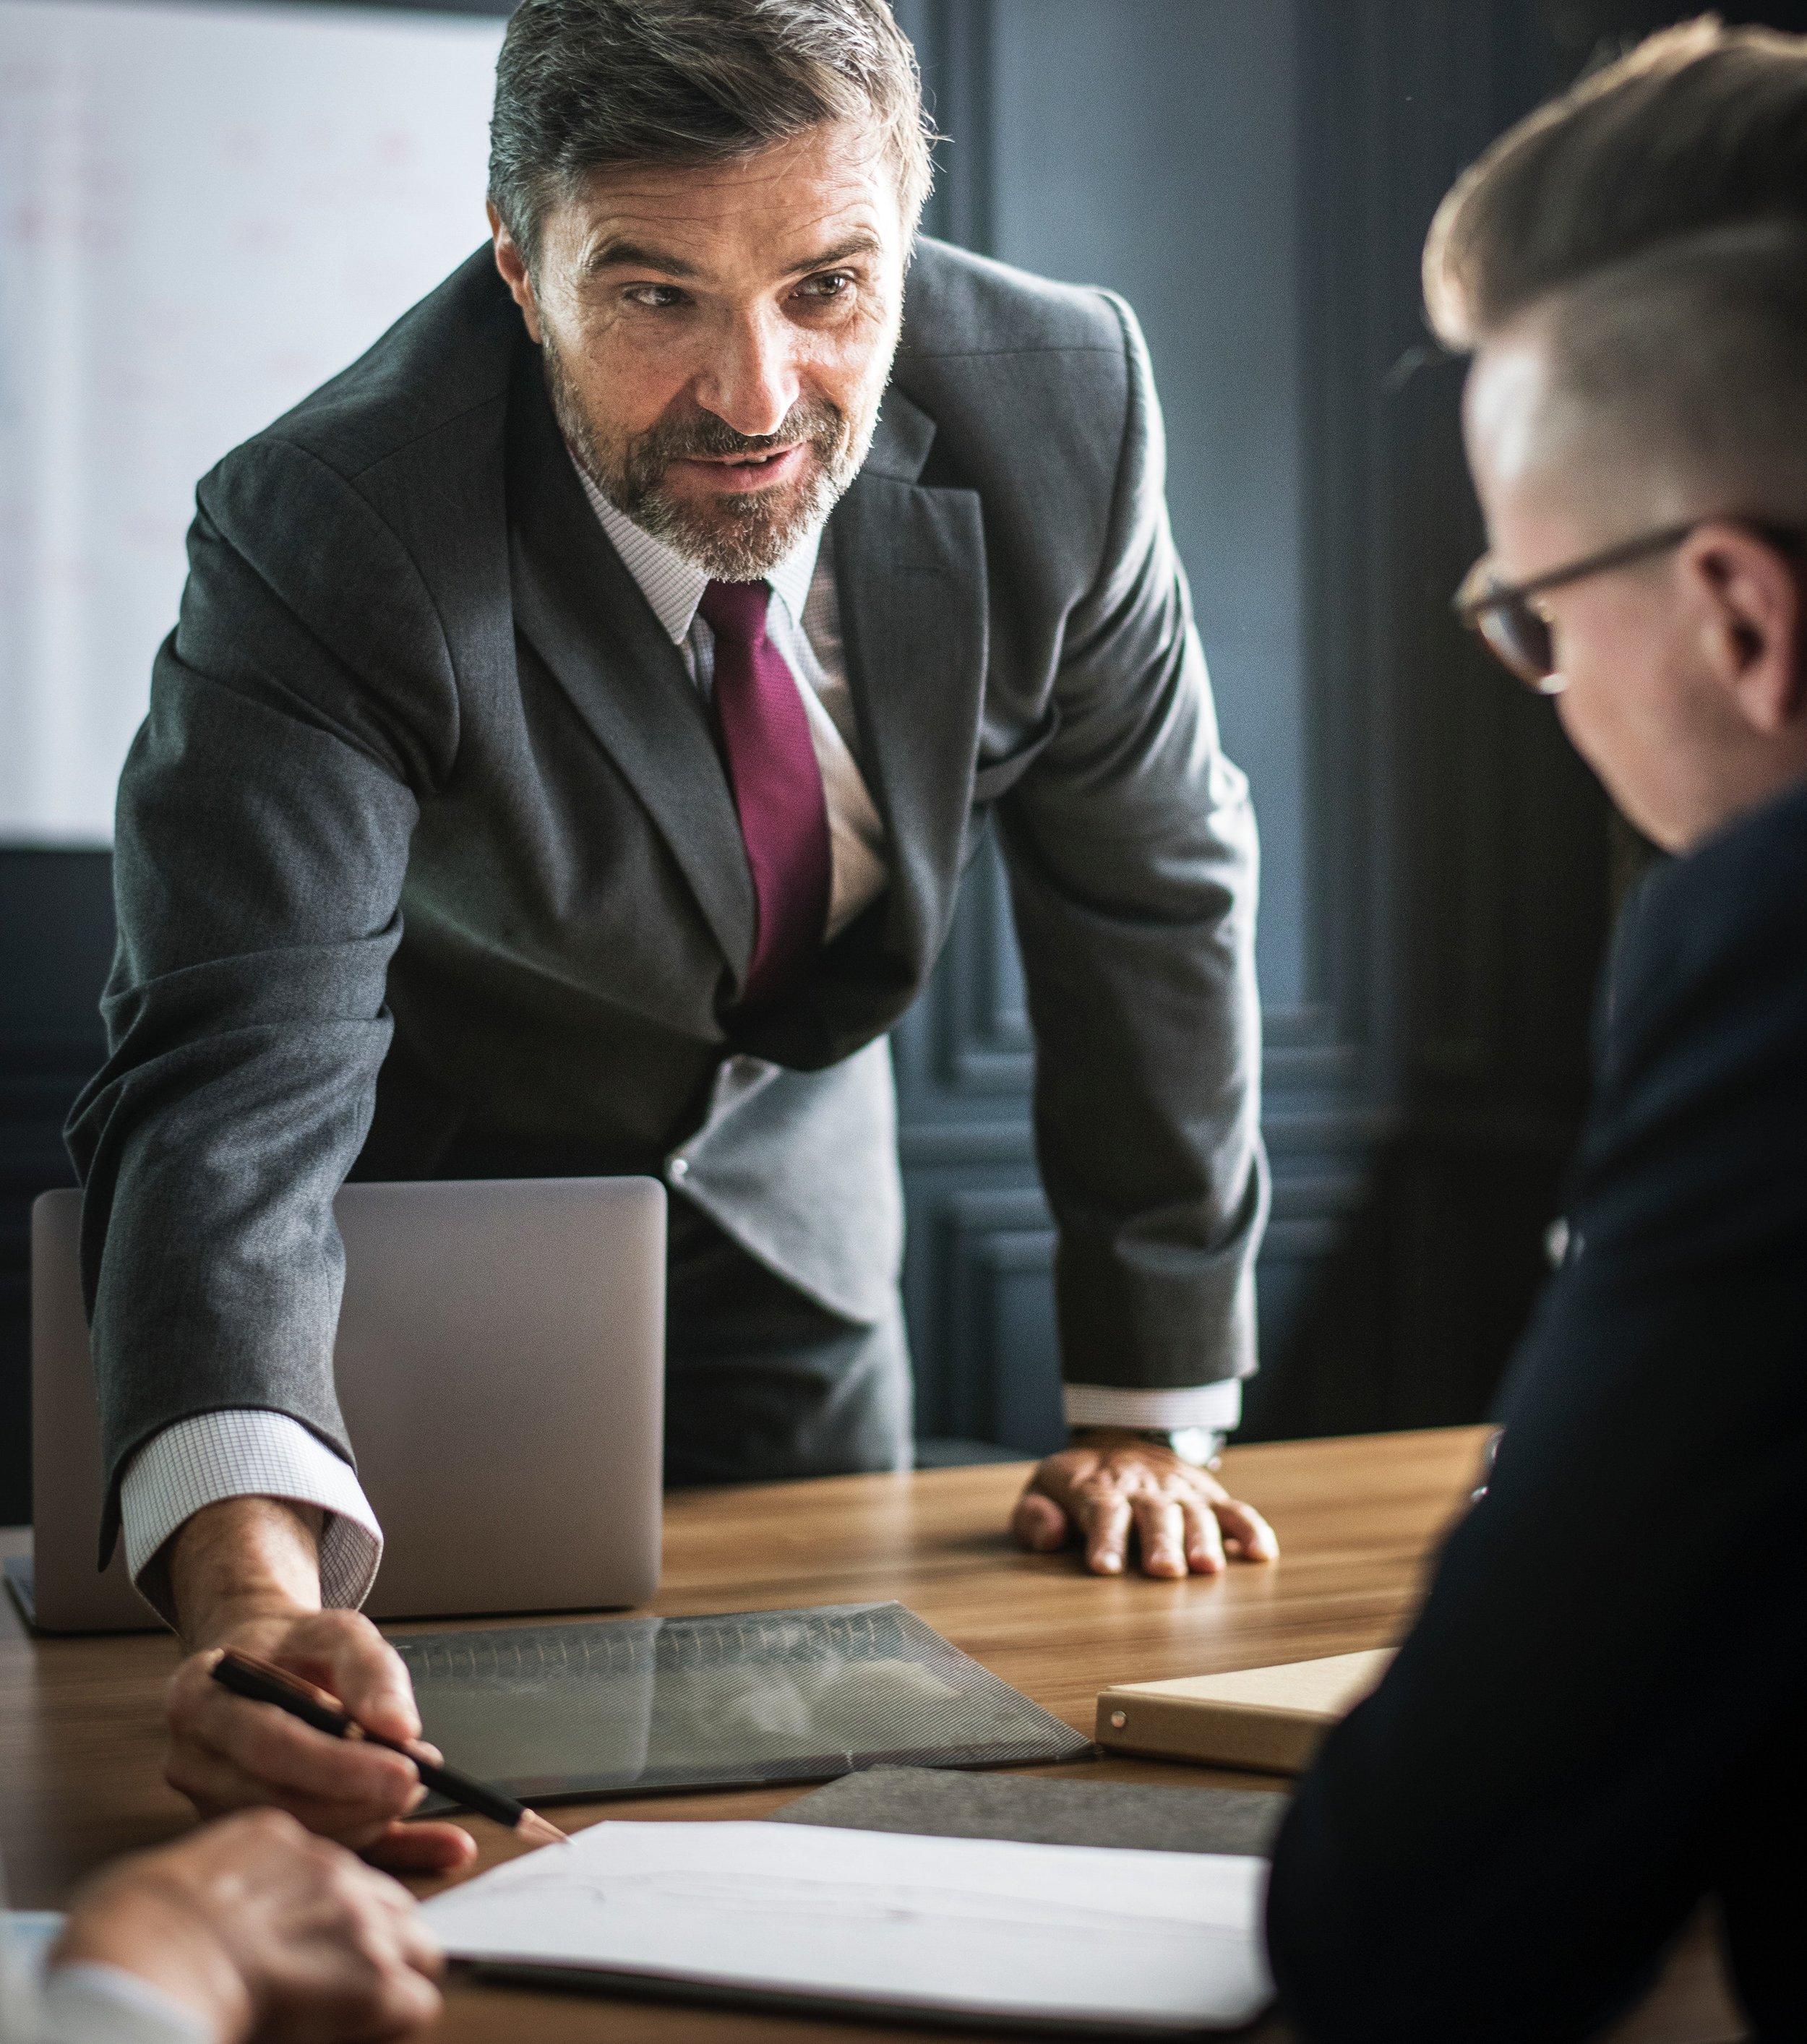 The Successful Male, Business Men Talking